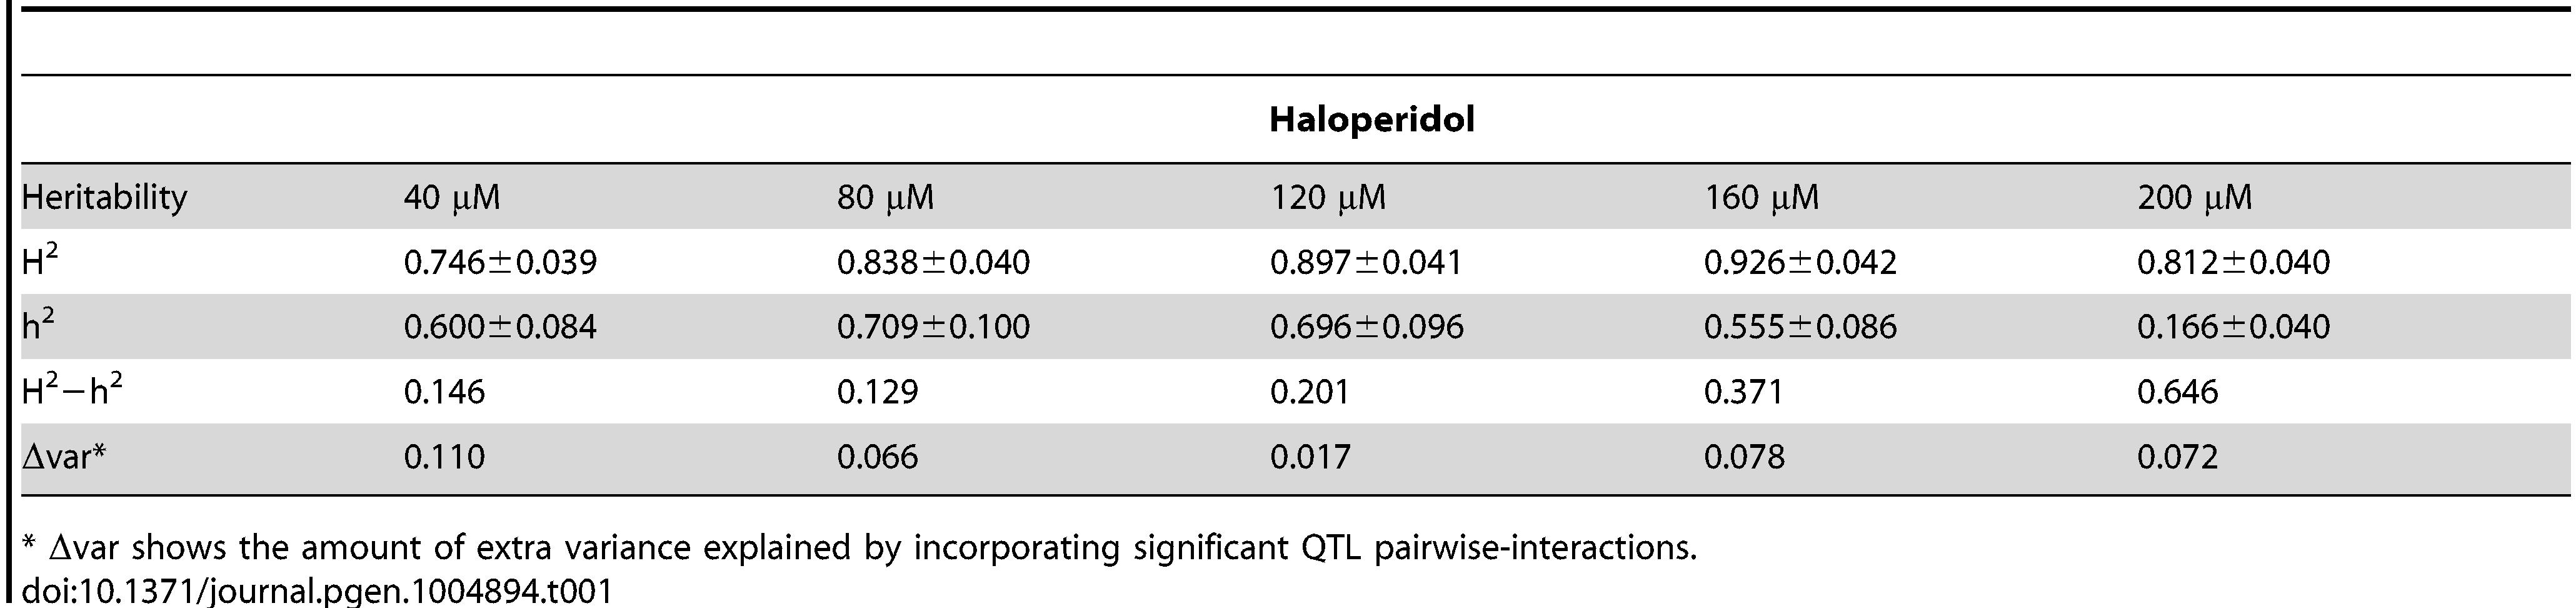 Broad (H<sup>2</sup>) and narrow (h<sup>2</sup>) sense heritability.